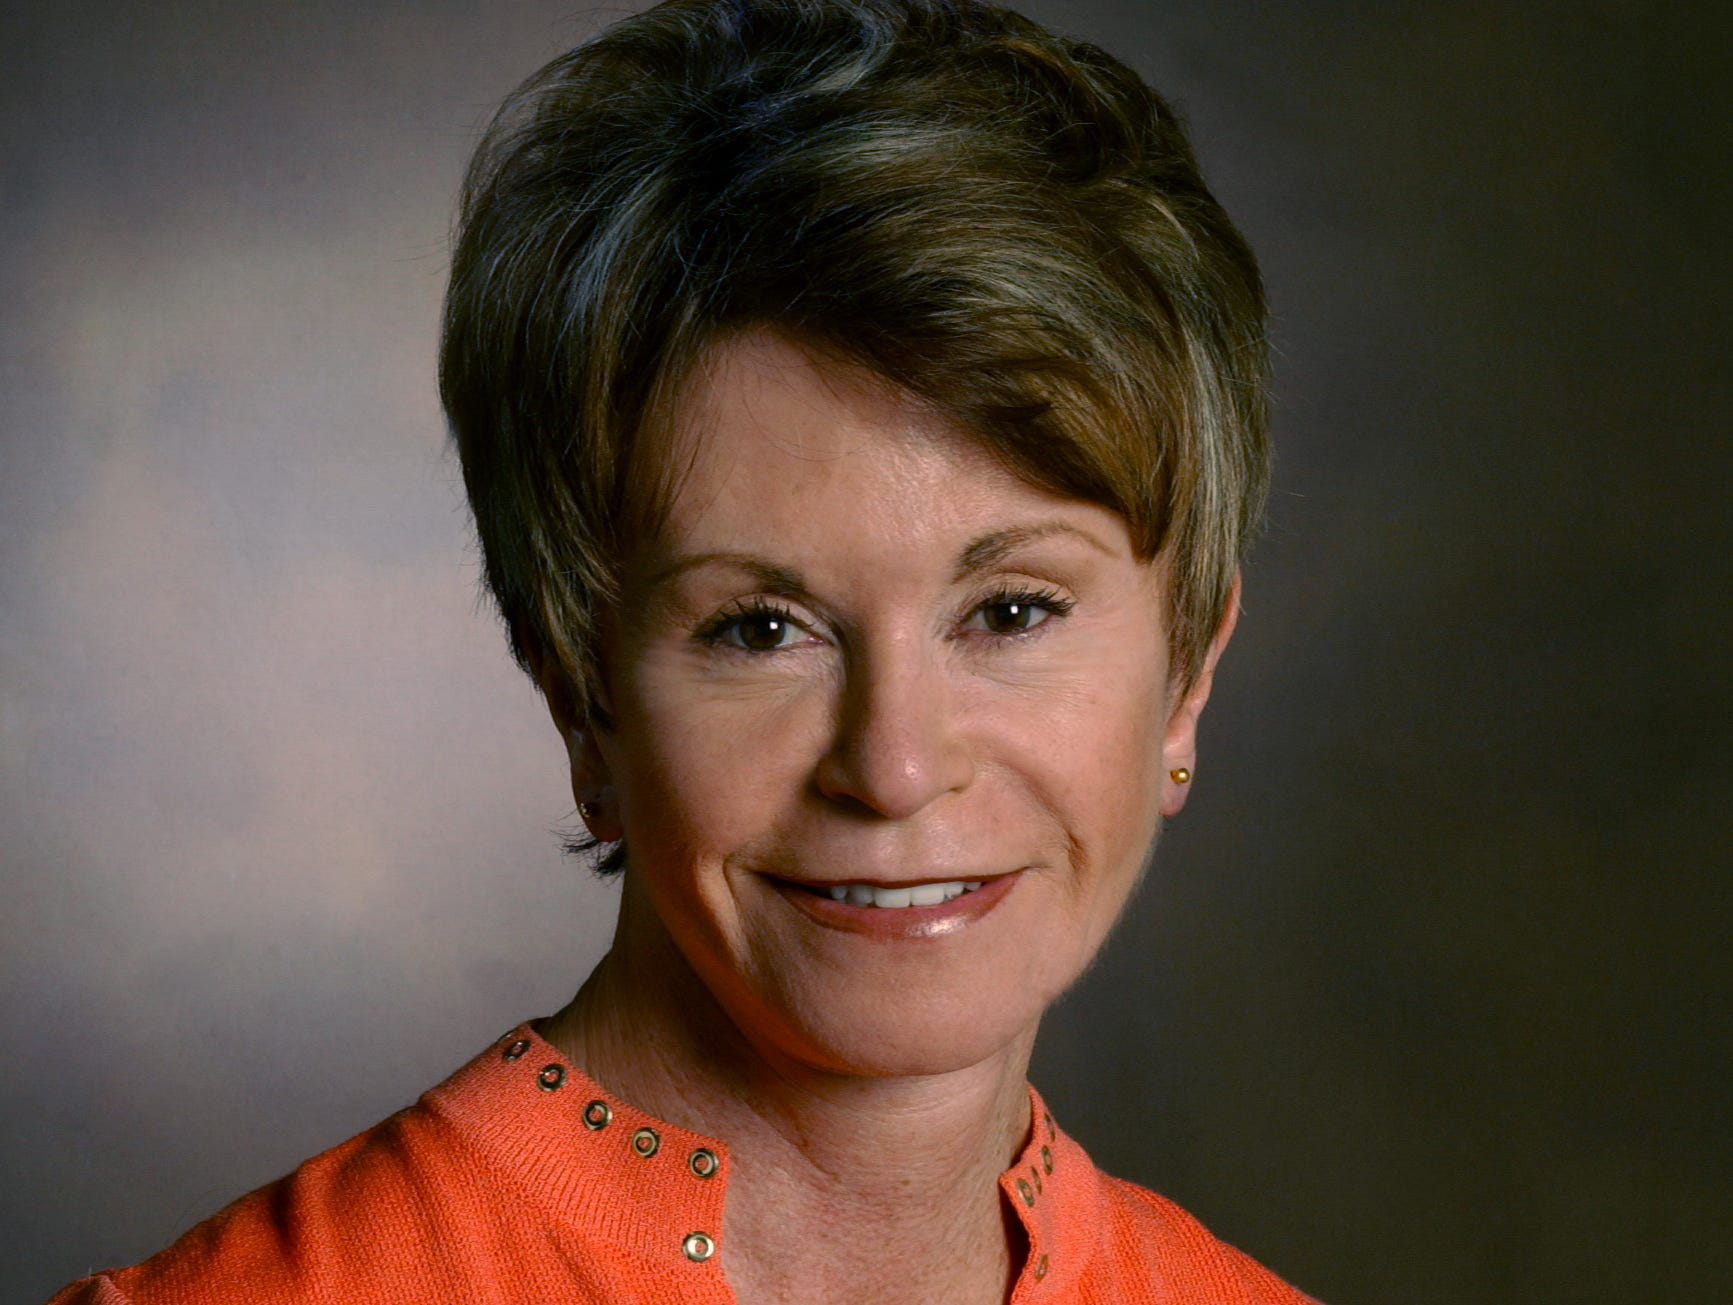 Colleen Conway-Welch, Ph.D., R.N., dean of Vanderbilt University School of Nursing, has been named to Modern Healthcare's list of the Top 25 Women in Healthcare for 2009. 4/24/2009 Colleen Conway- Welch, Dean of Nursing, Vanderbilt School of Nursing, portrait